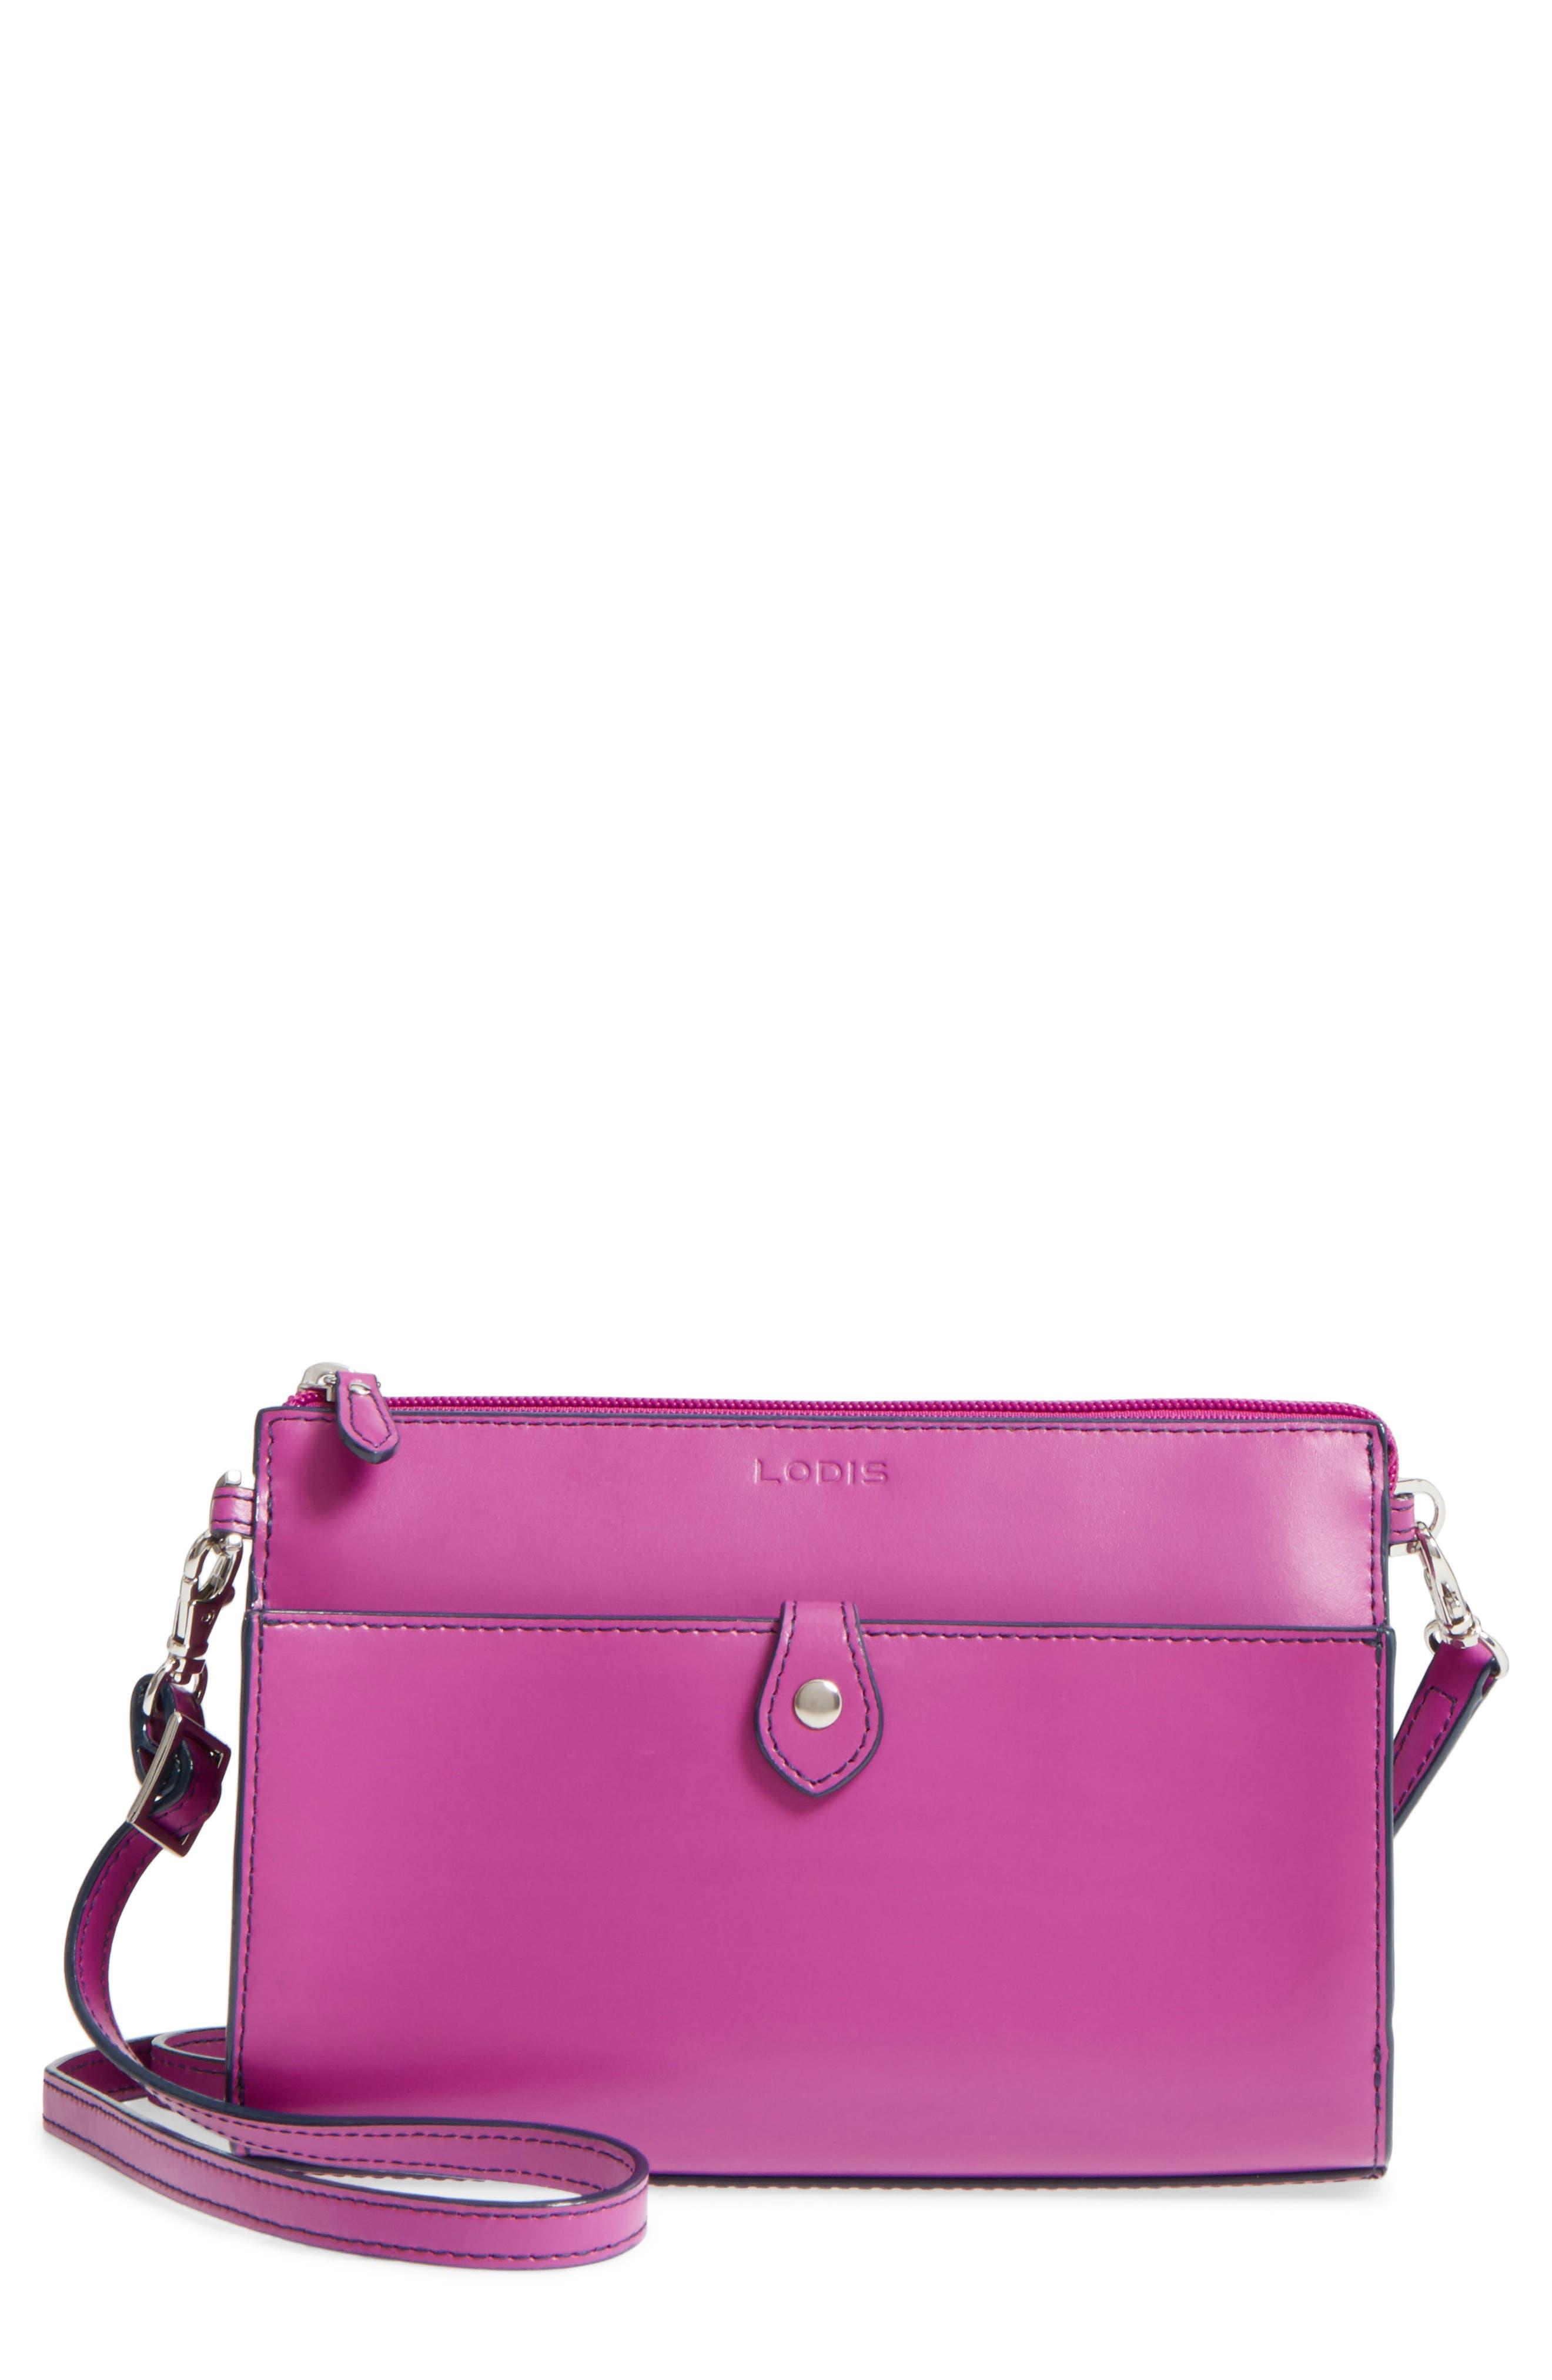 Main Image - LODIS Audrey Under Lock & Key Vicky Convertible Leather Crossbody Bag